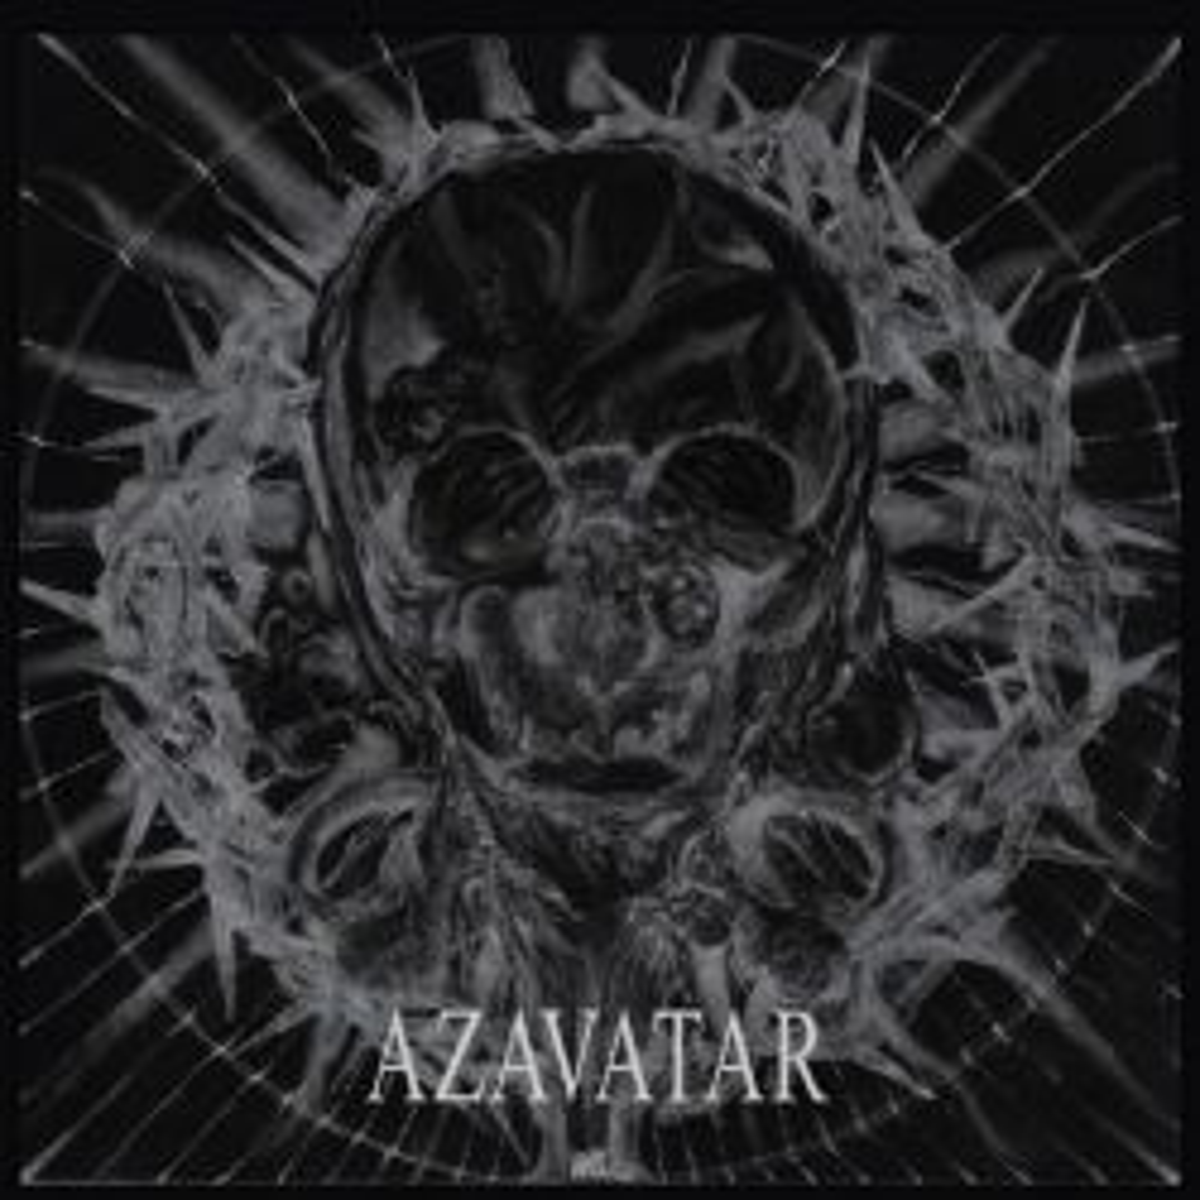 Review for Azavatar - Azavatar